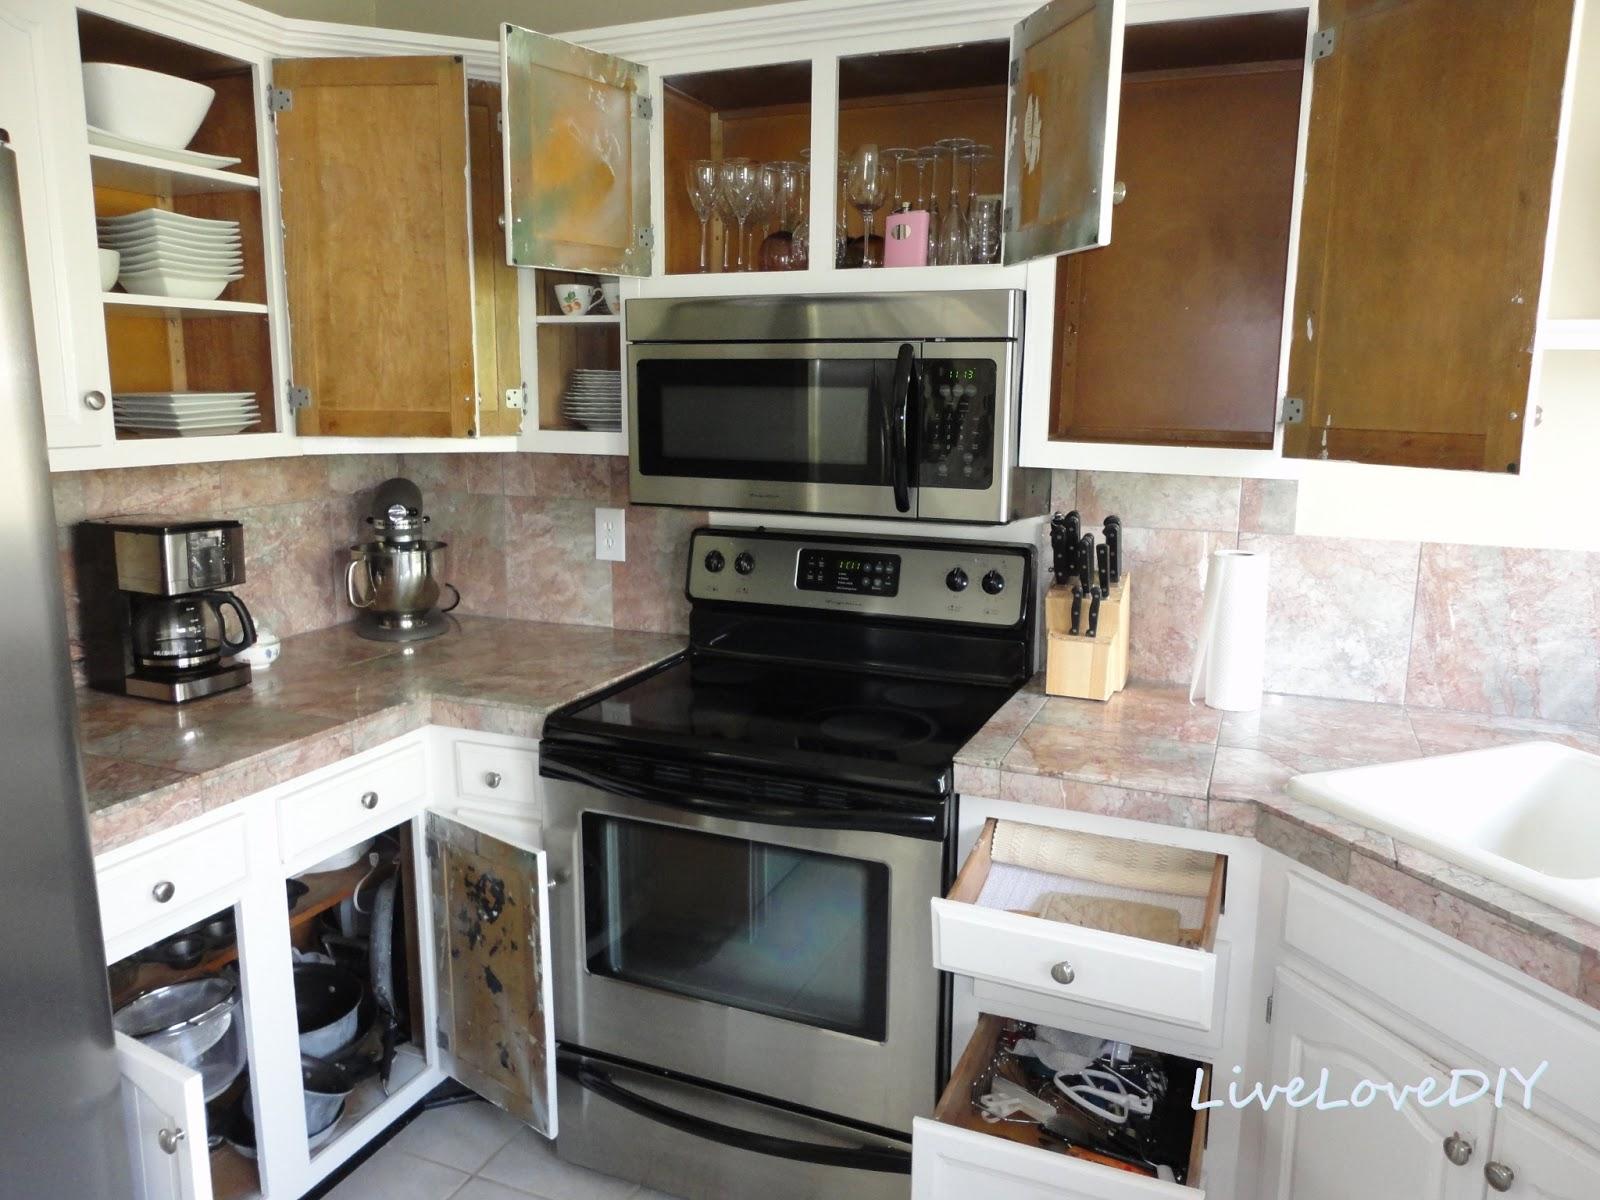 Livelovediy Creative Ways To Update Your Kitchen Using Paint